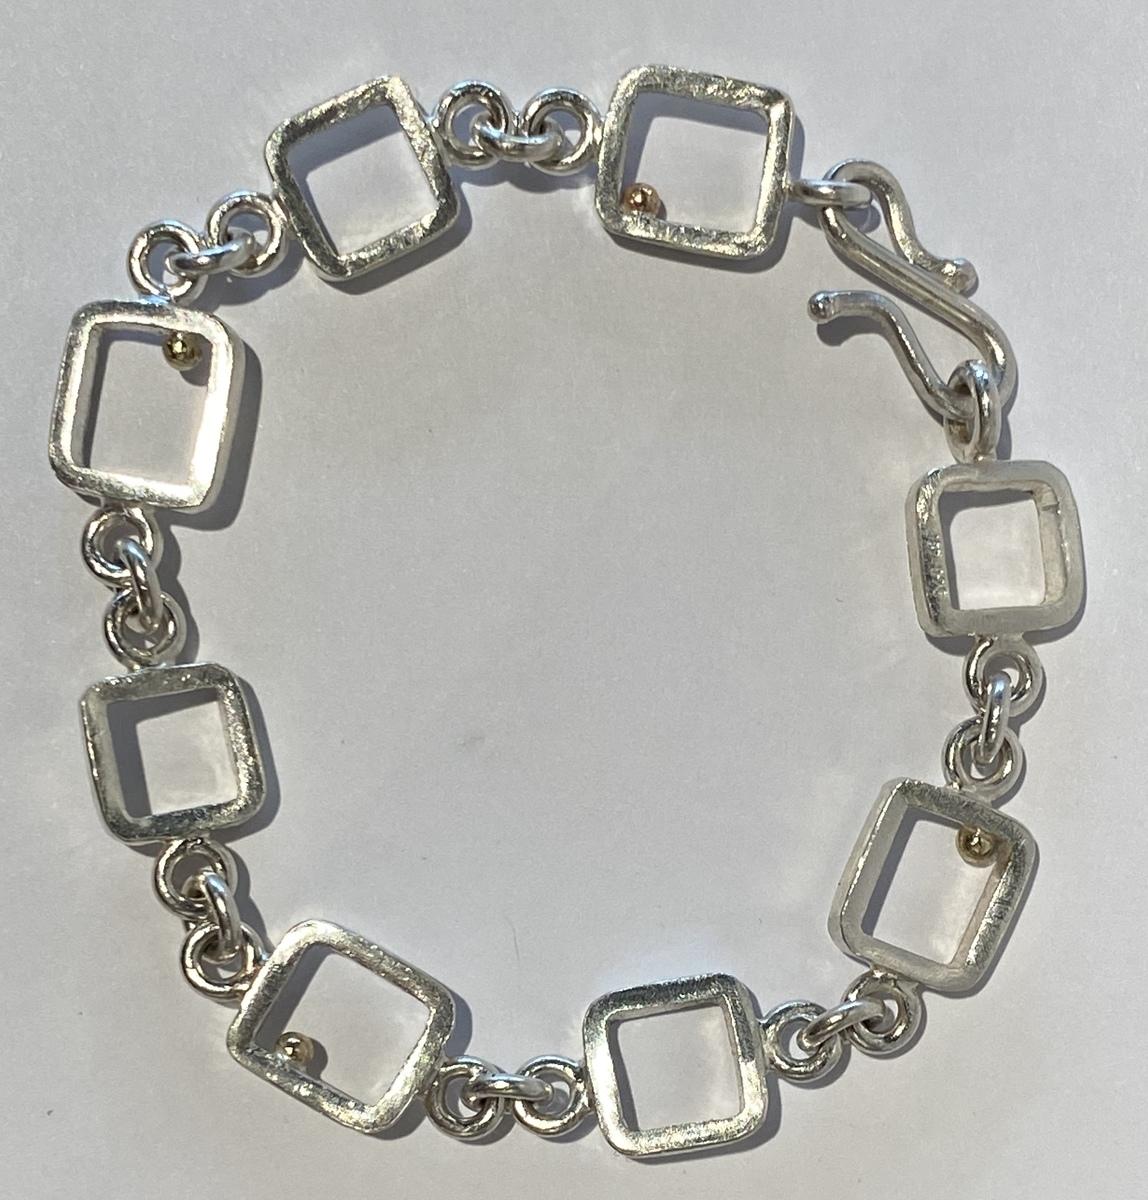 Sterling silver bracelet - GOLD BALL SERIES